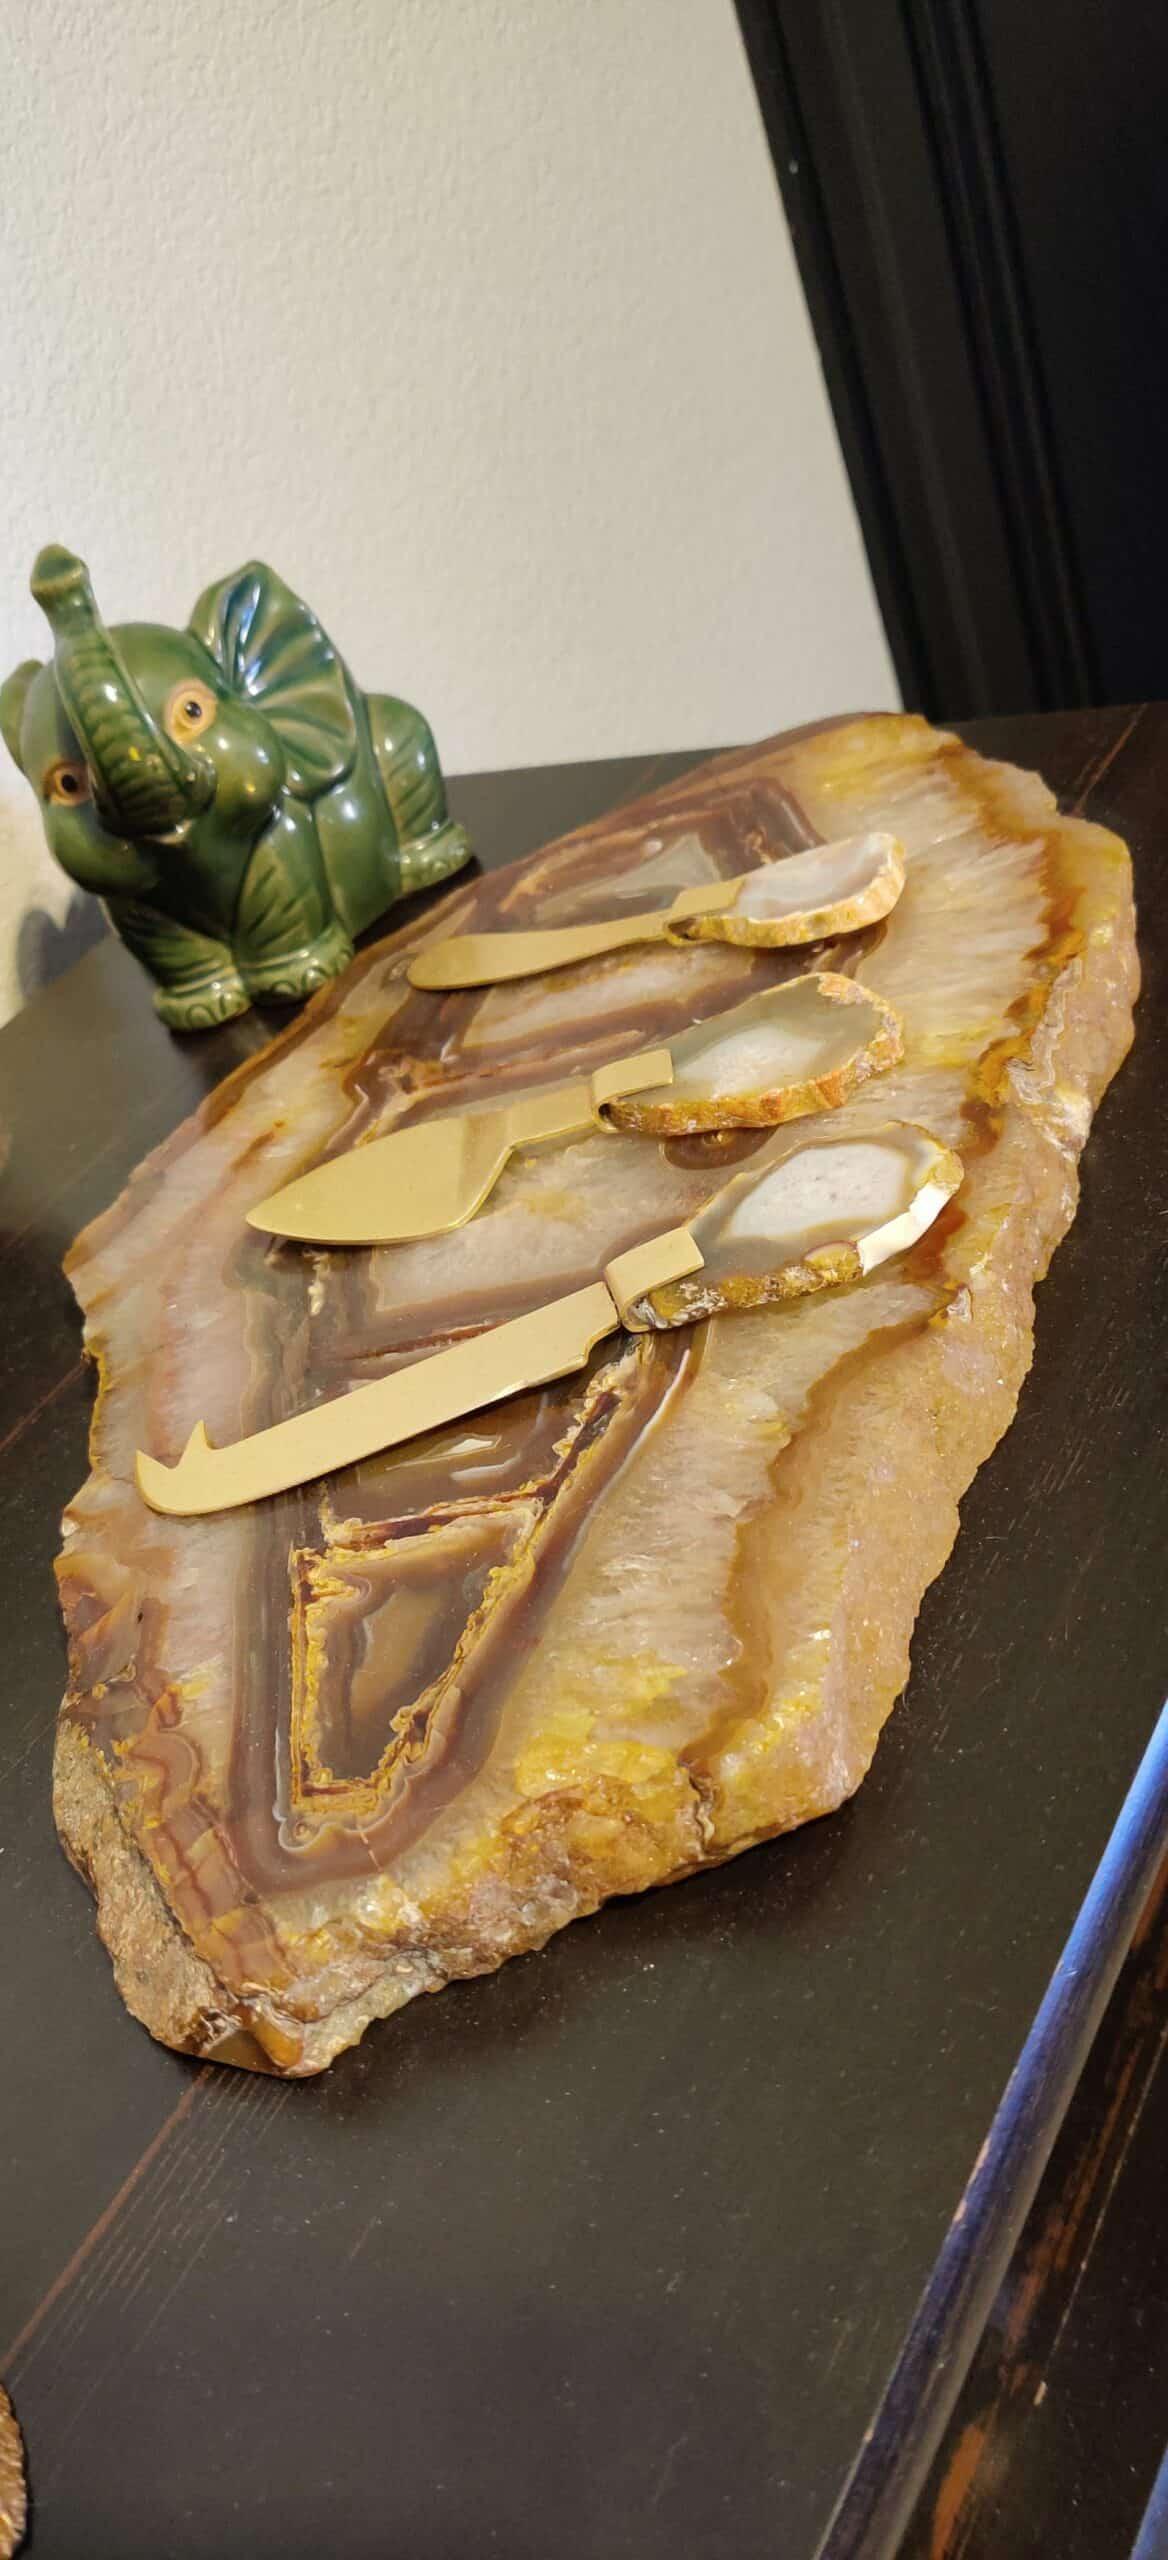 Gem stone charcuterie board